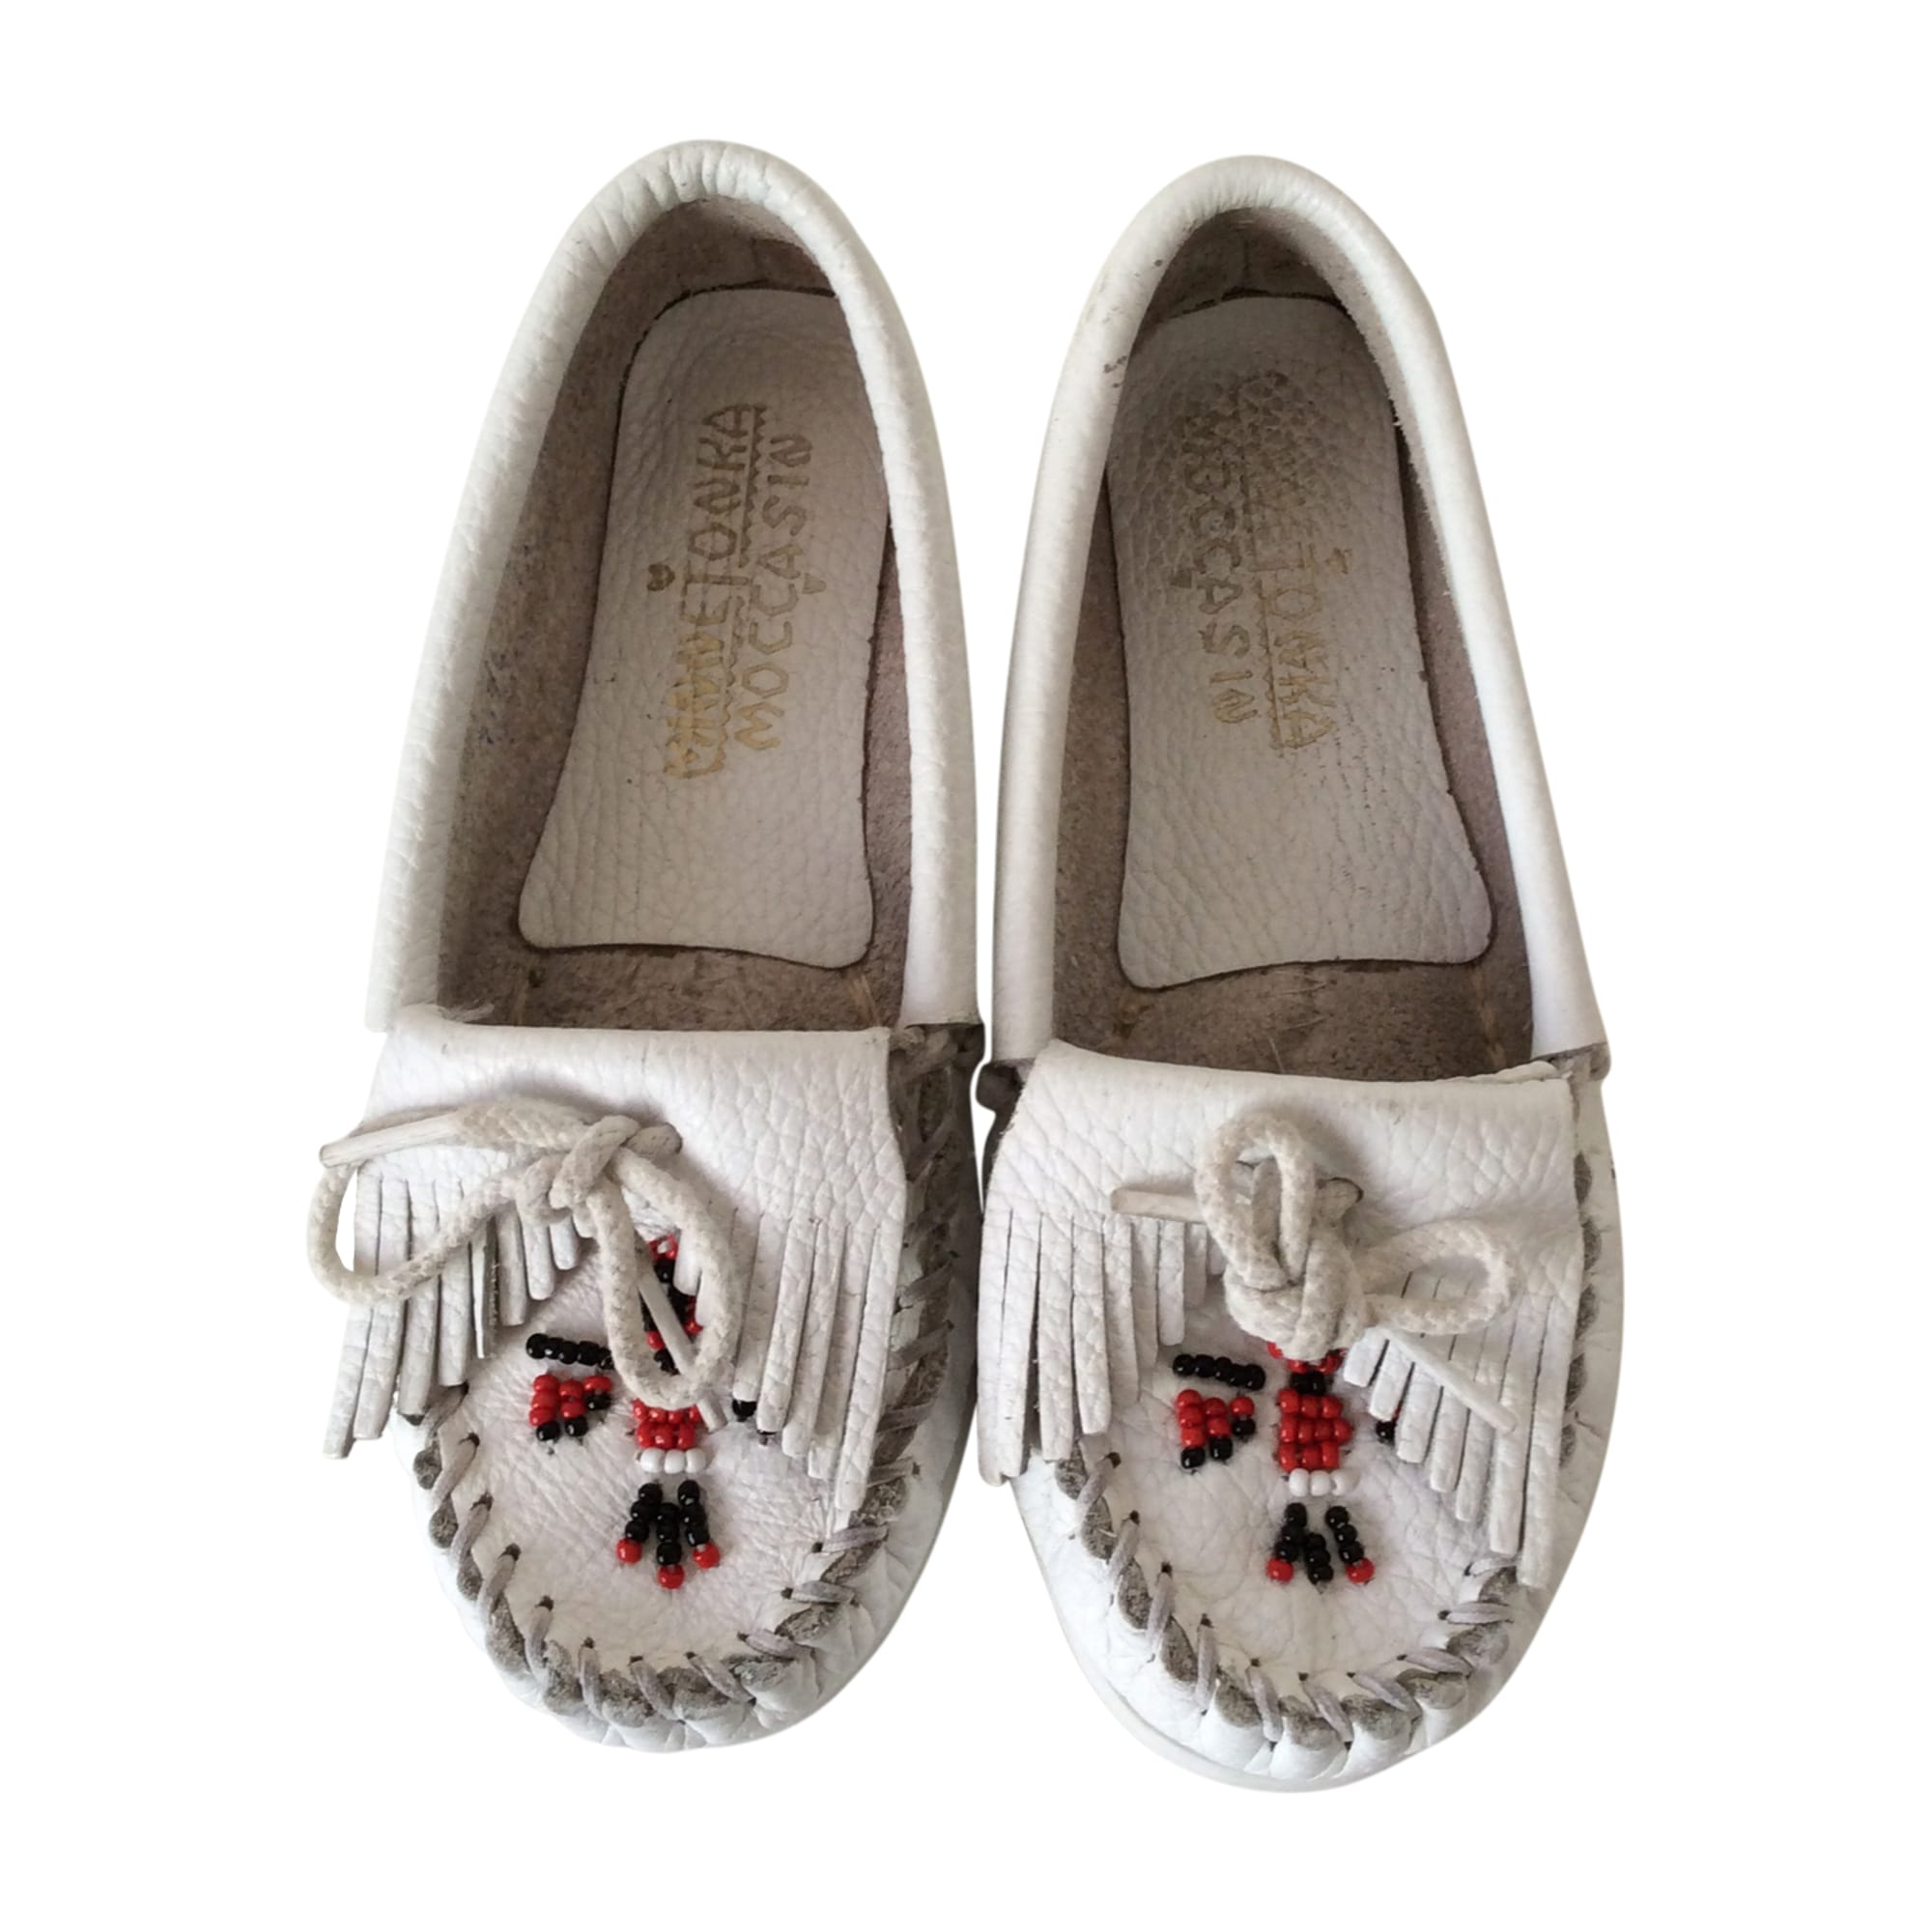 Loafers MINNETONKA White, off-white, ecru